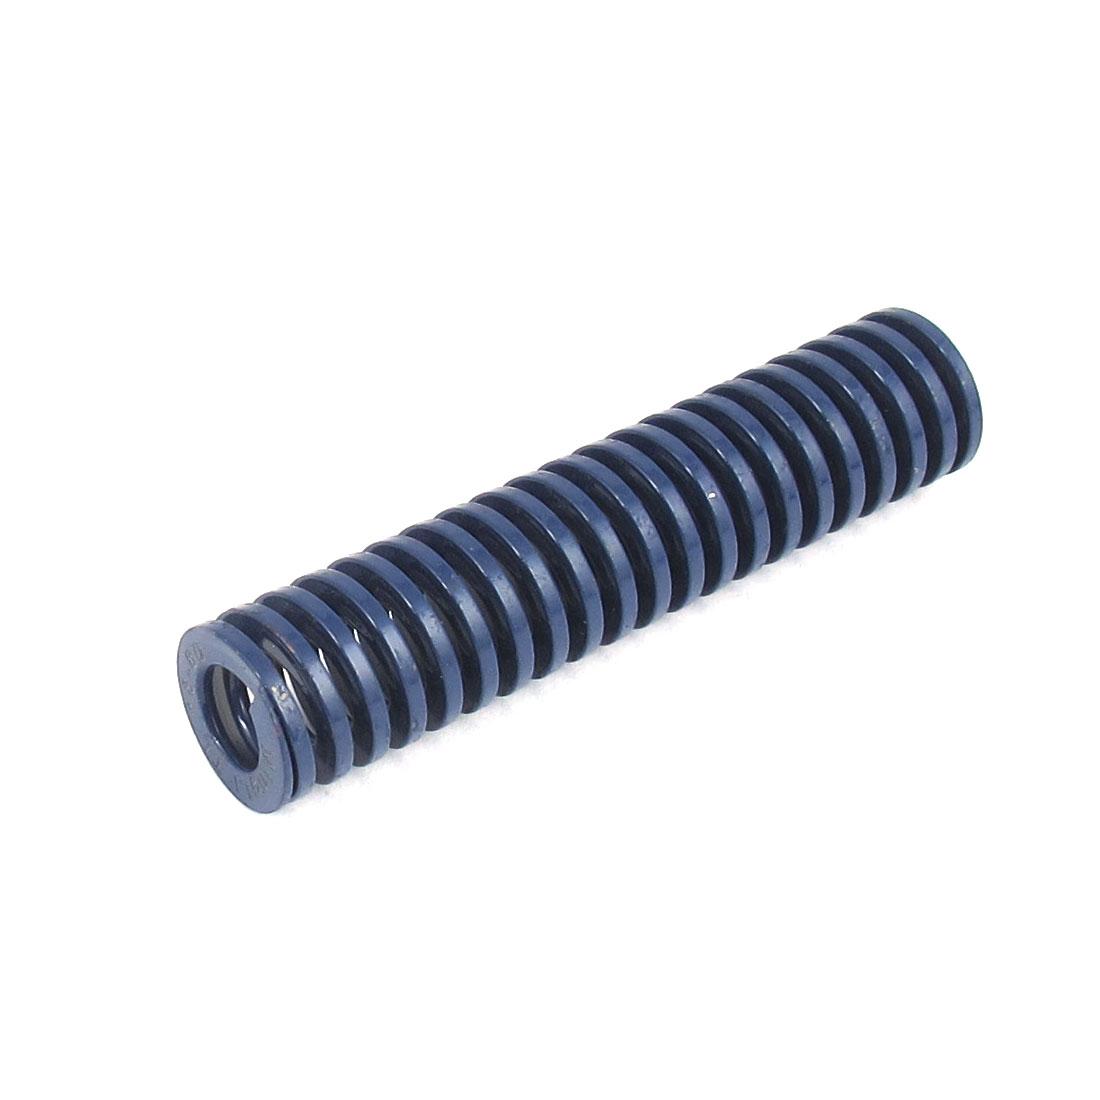 18mmx80mm Chromium Alloy Steel Light Load Die Spring Blue